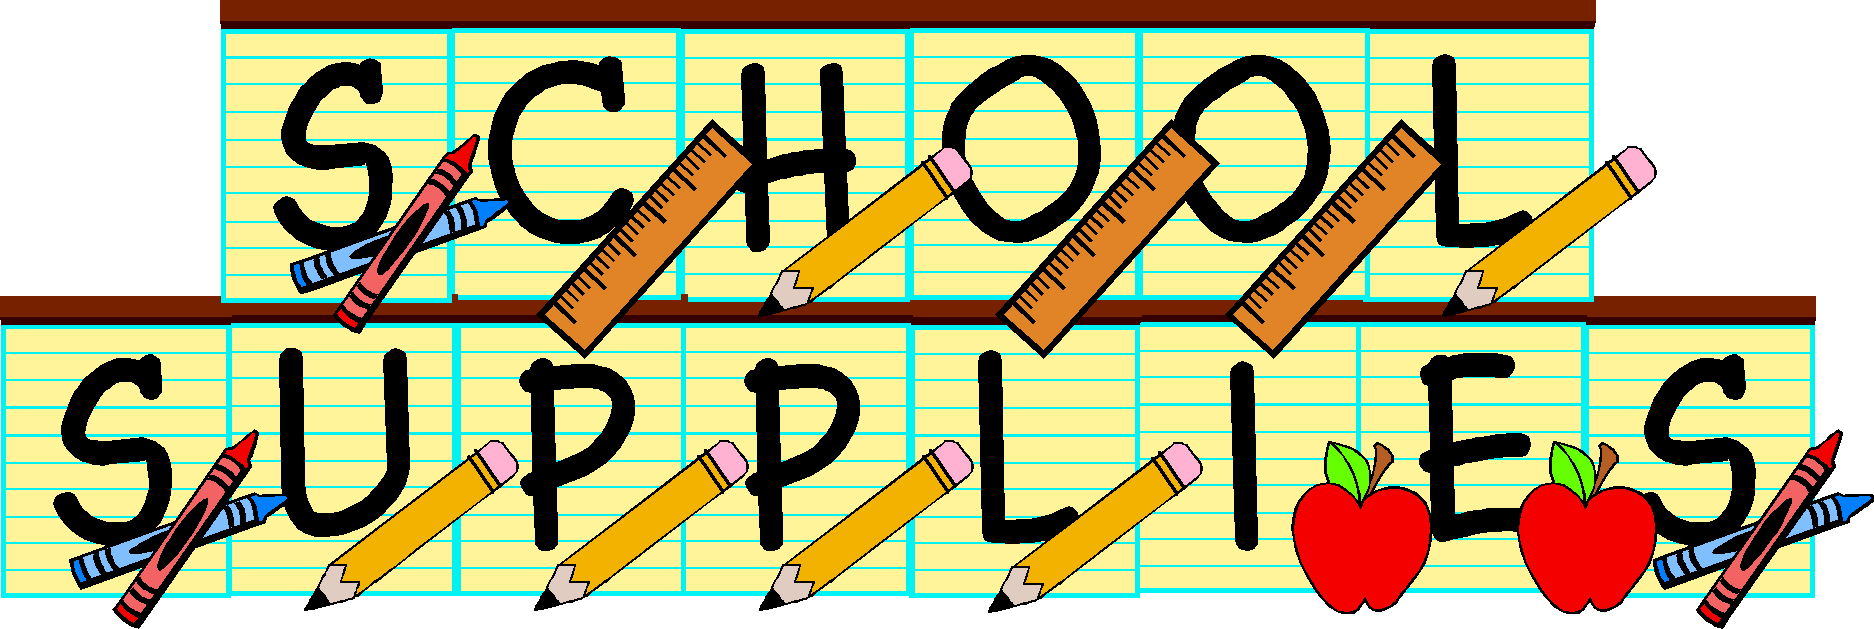 Mission Registration School S - School Supplies Clipart